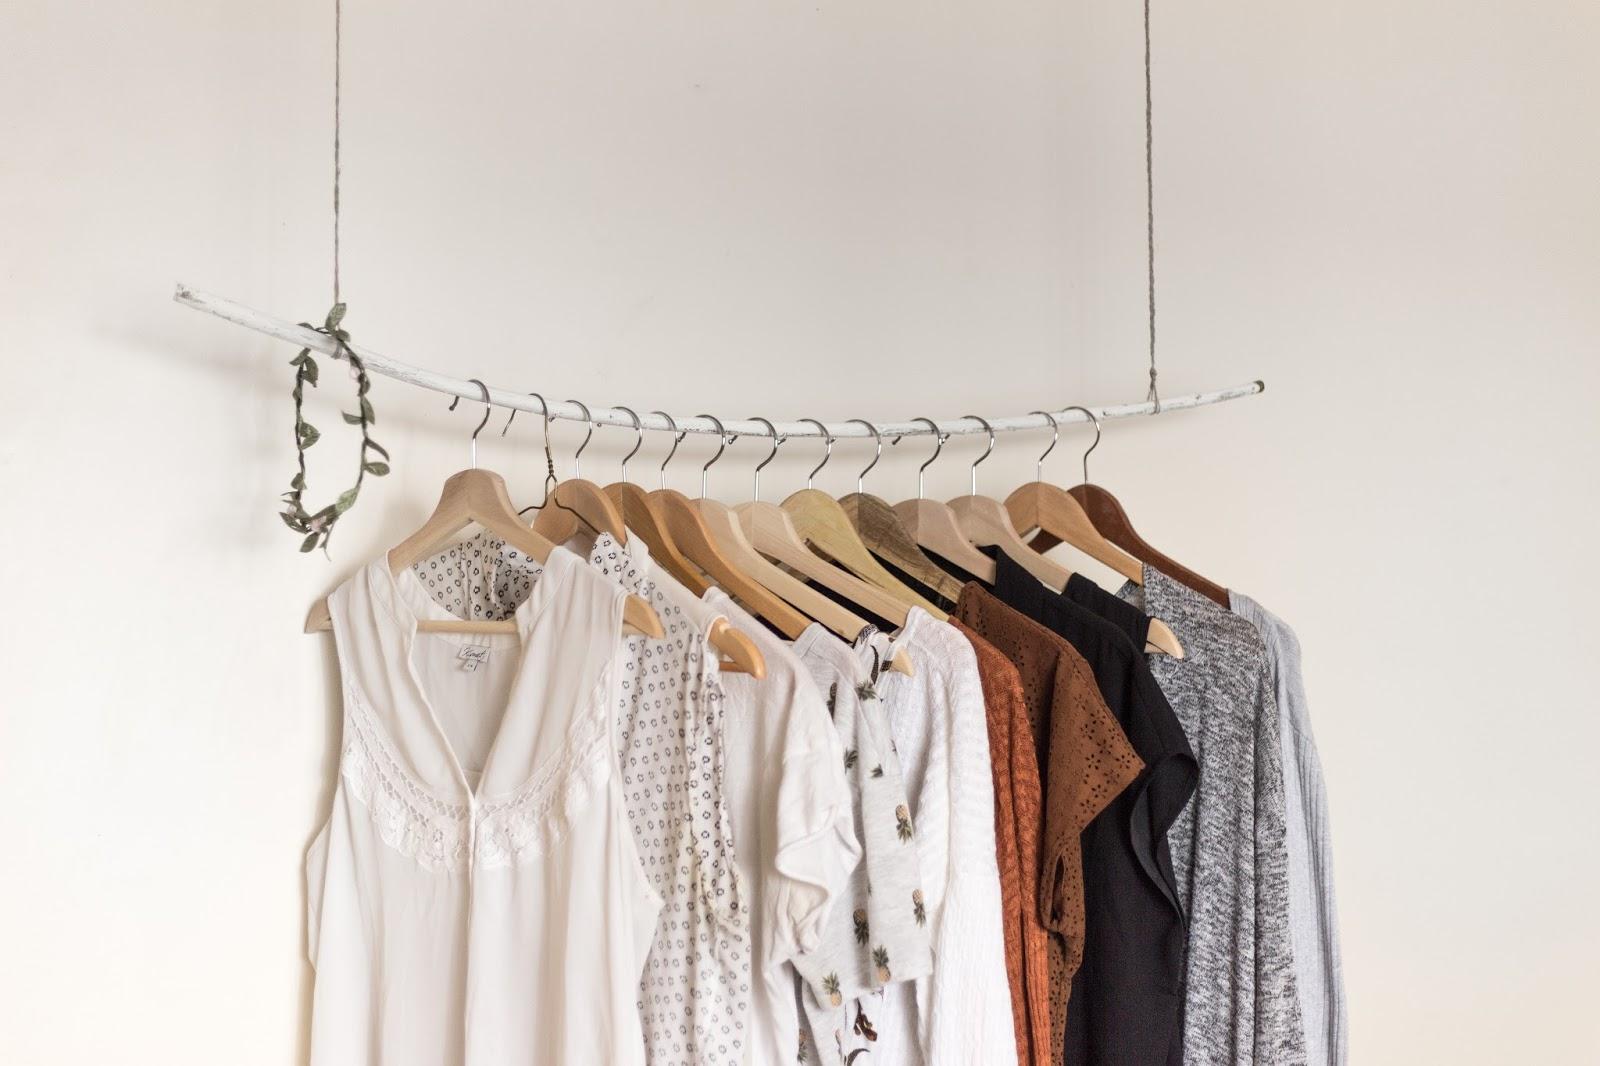 2017 Summer Fashion Trends